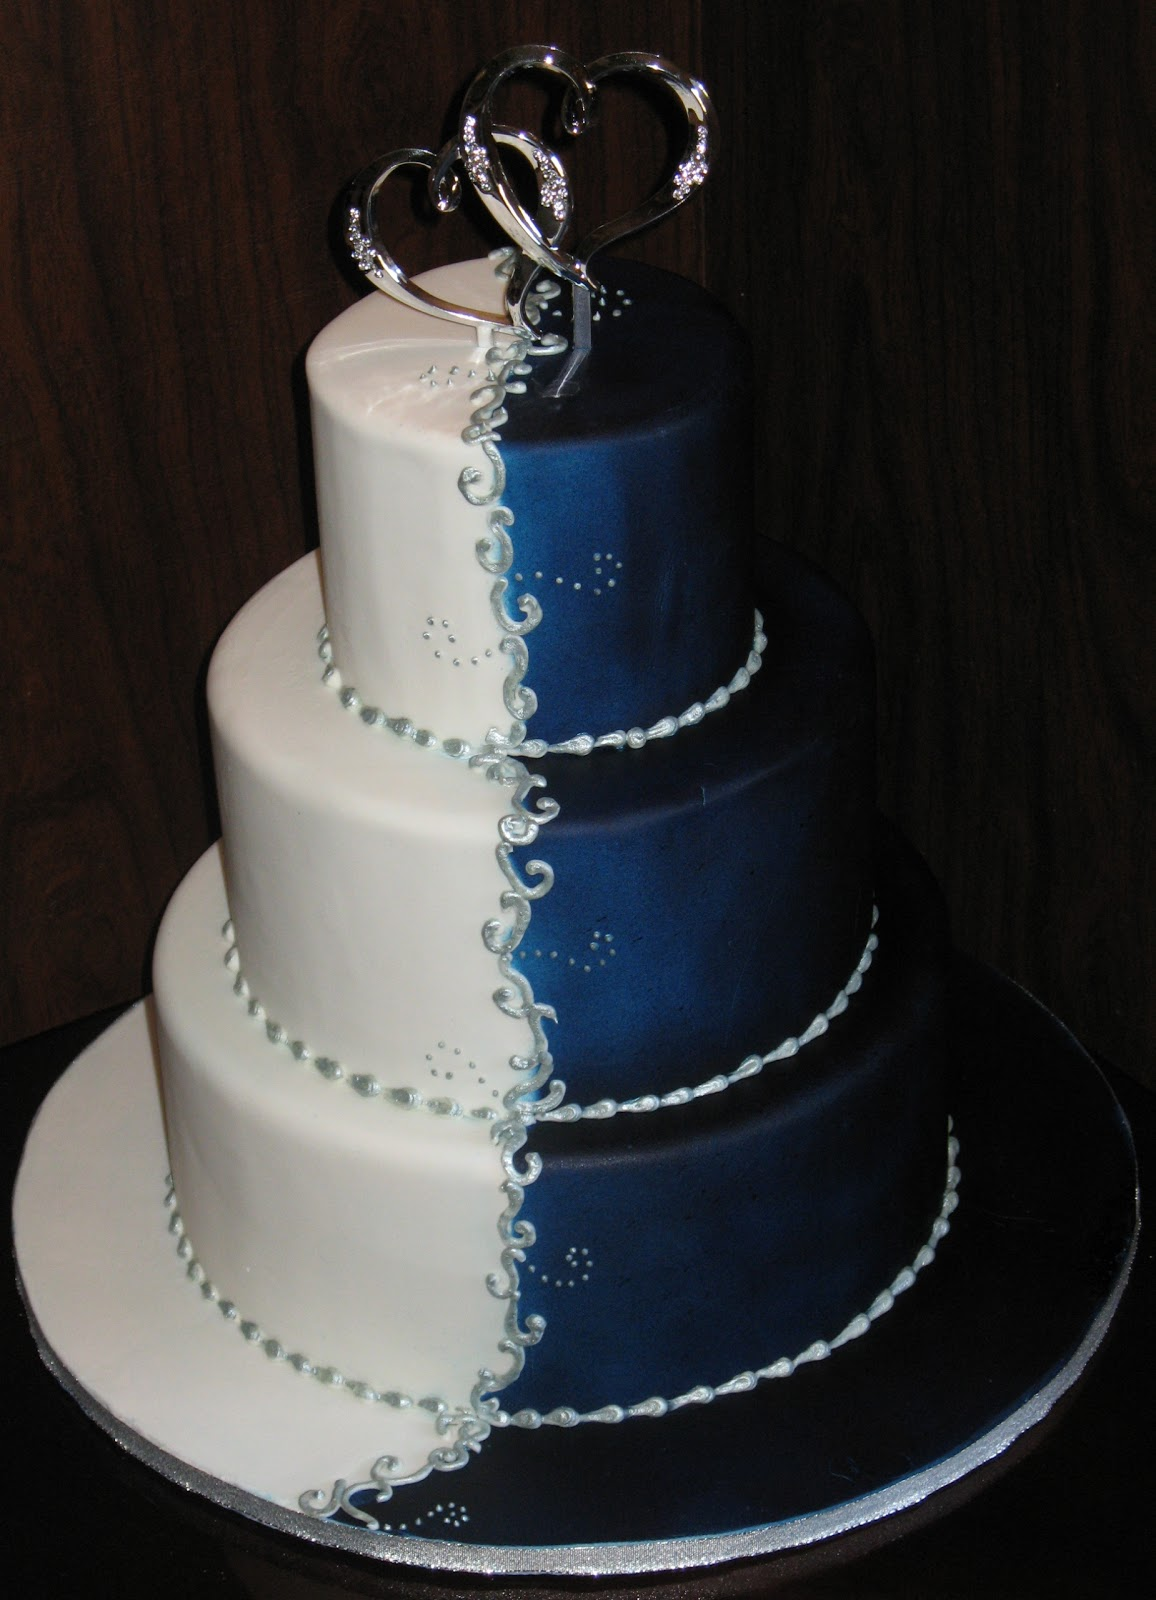 Pin Navy Blue Wedding Cake Cake on Pinterest